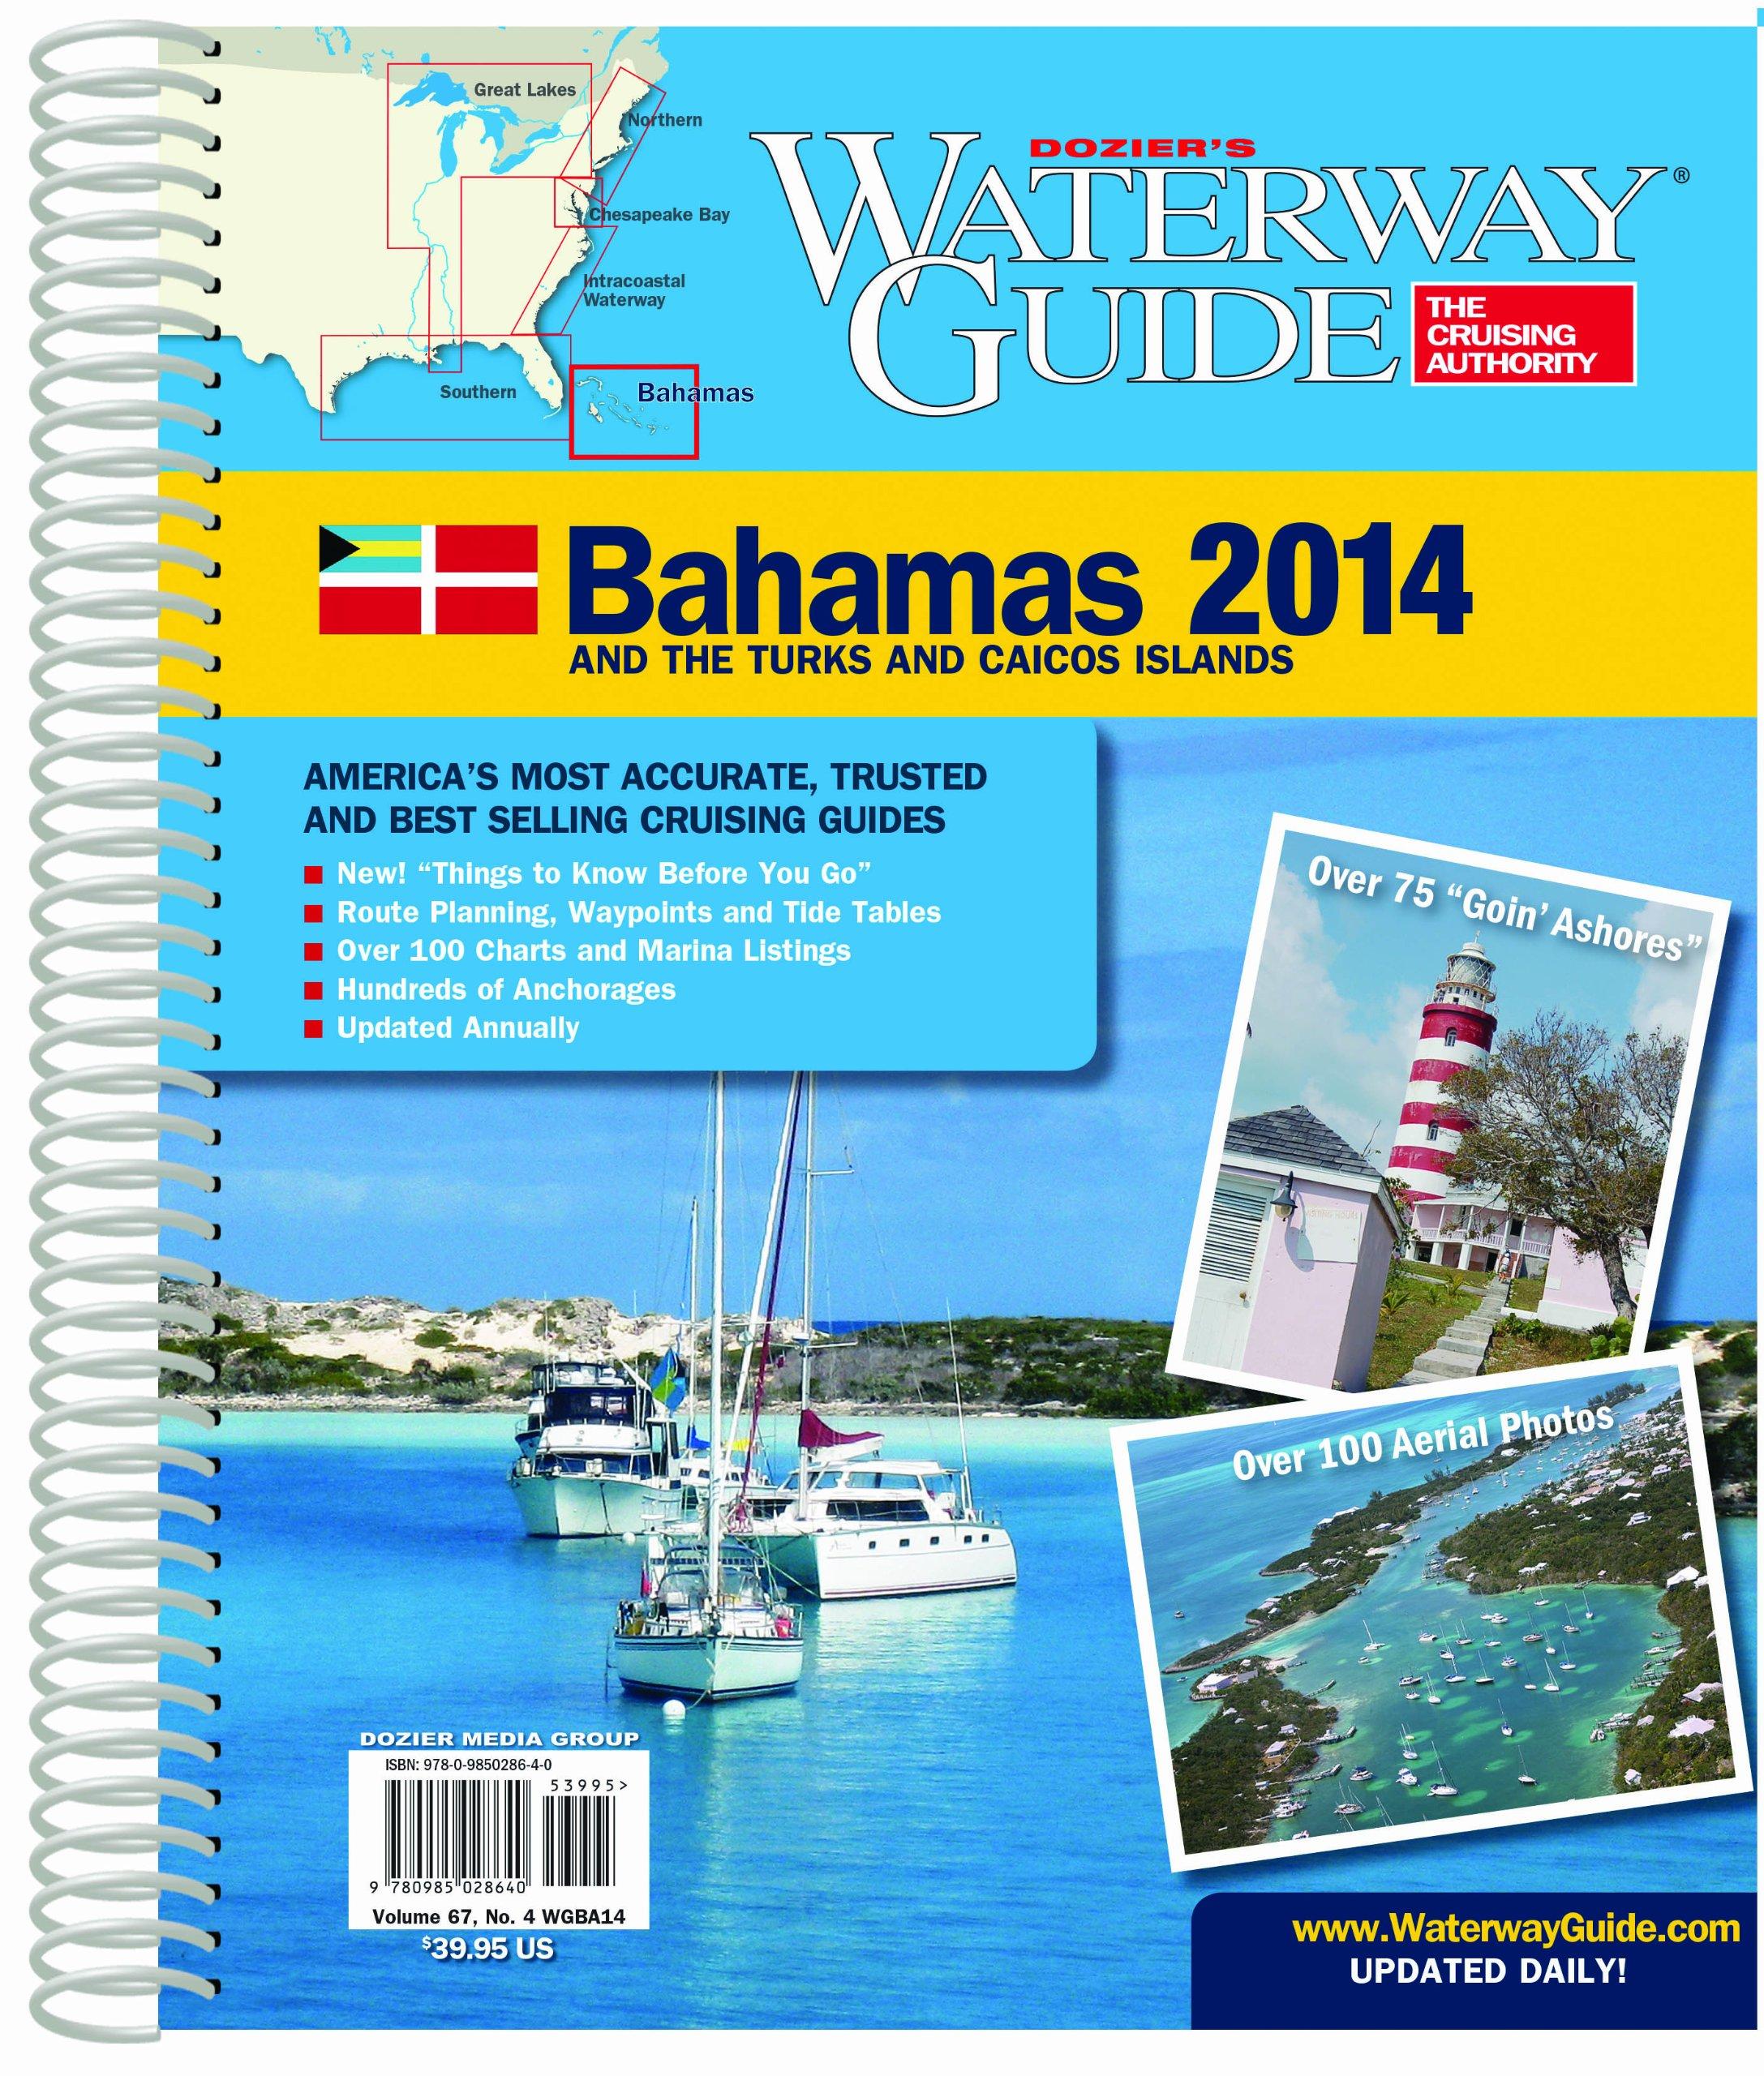 Waterway Guide Bahamas 2014